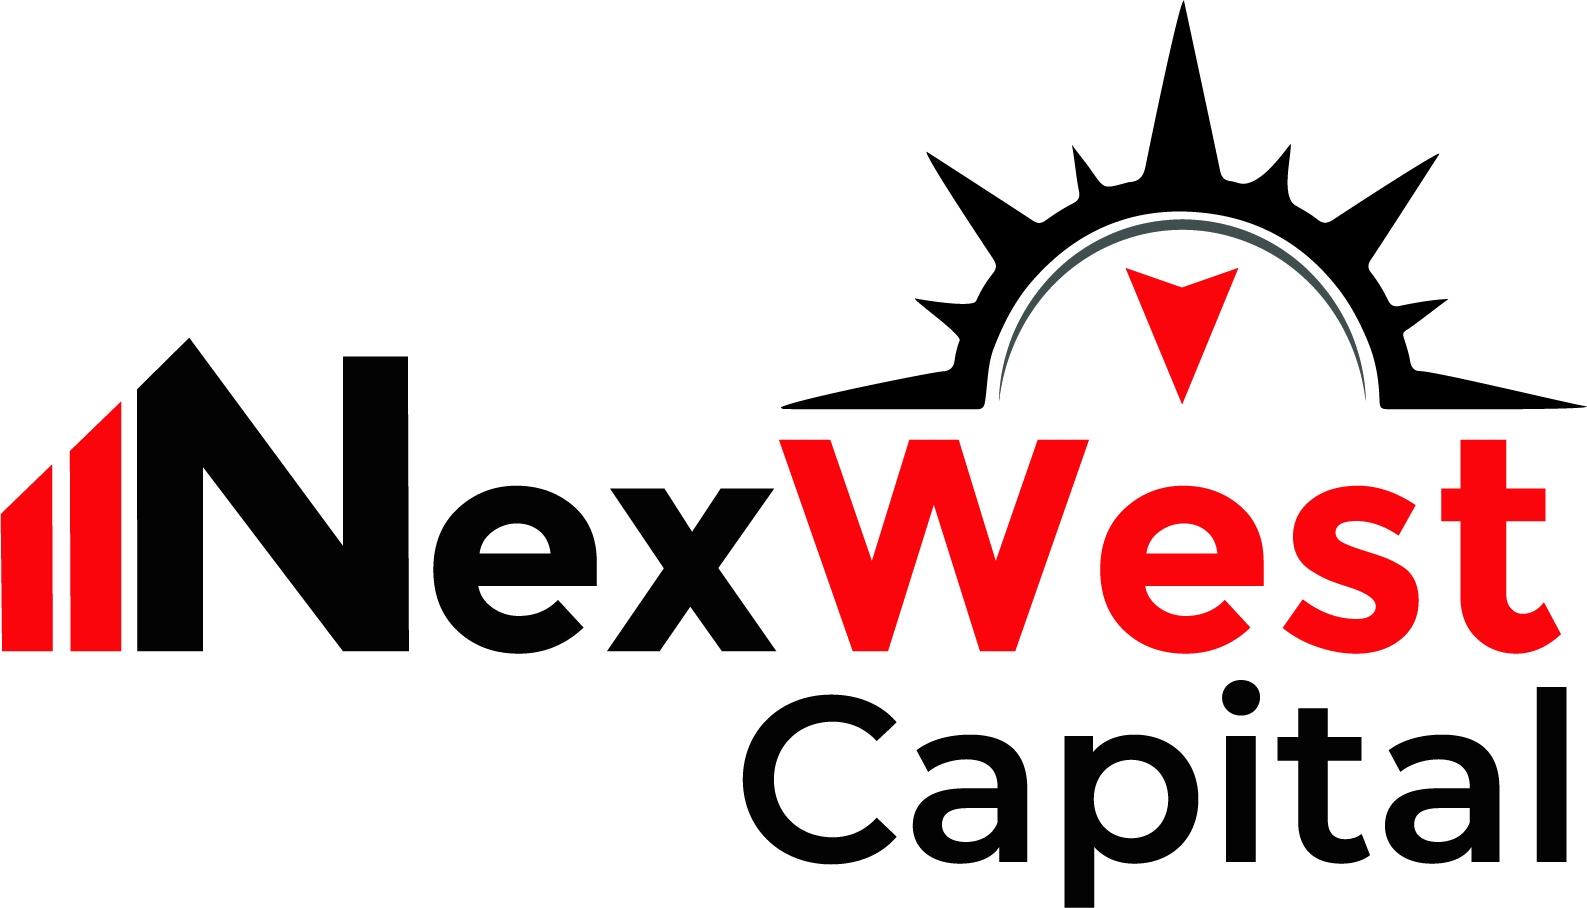 Nexwest Capital